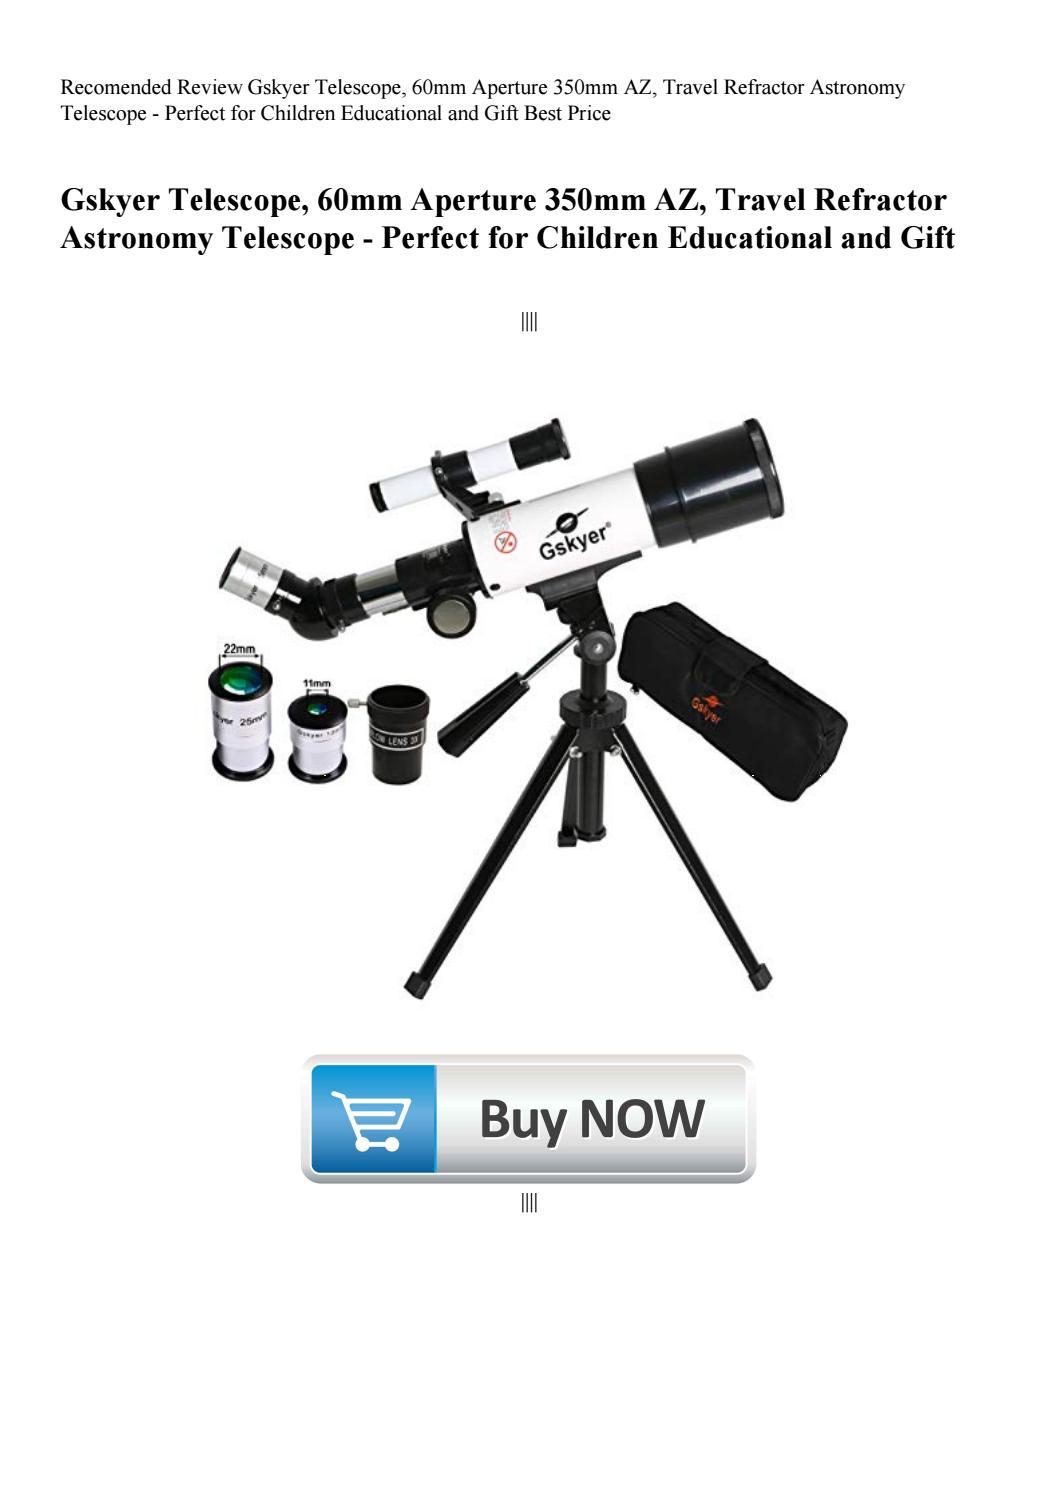 Recomended Review Gskyer Telescope 60mm Aperture 350mm AZ